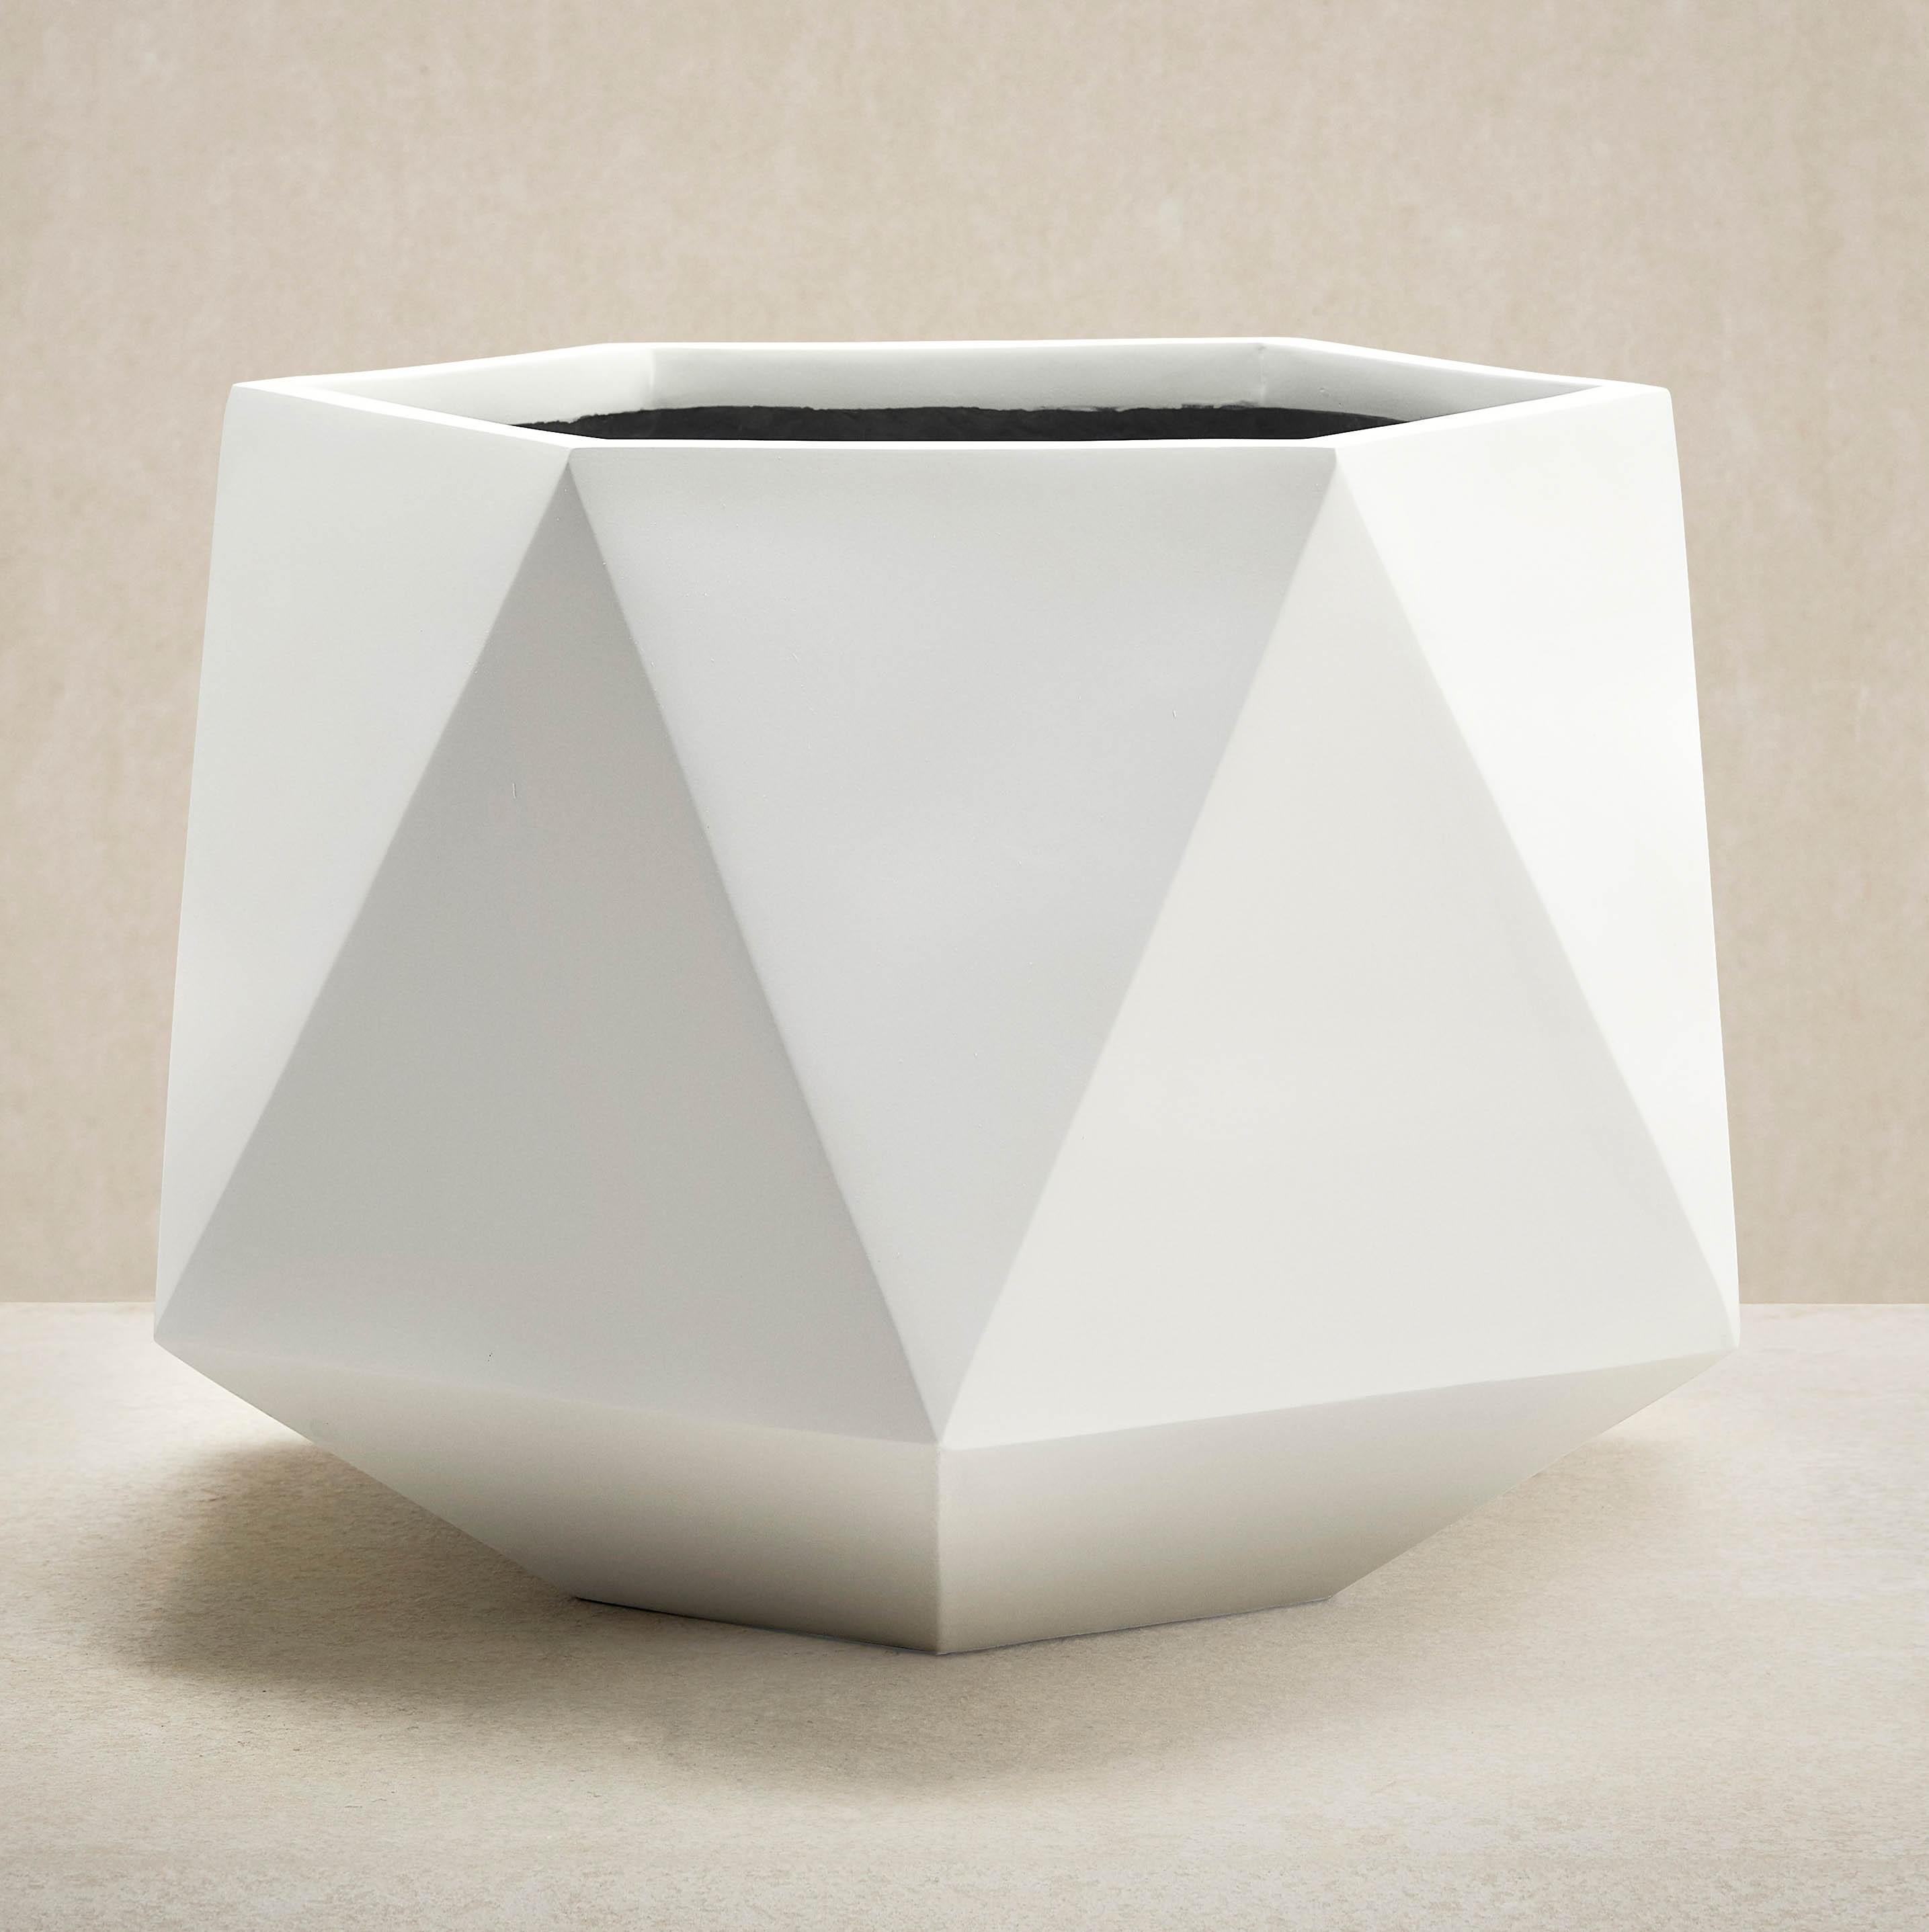 Decor Fibreglass Hero Geometrica-hero-01